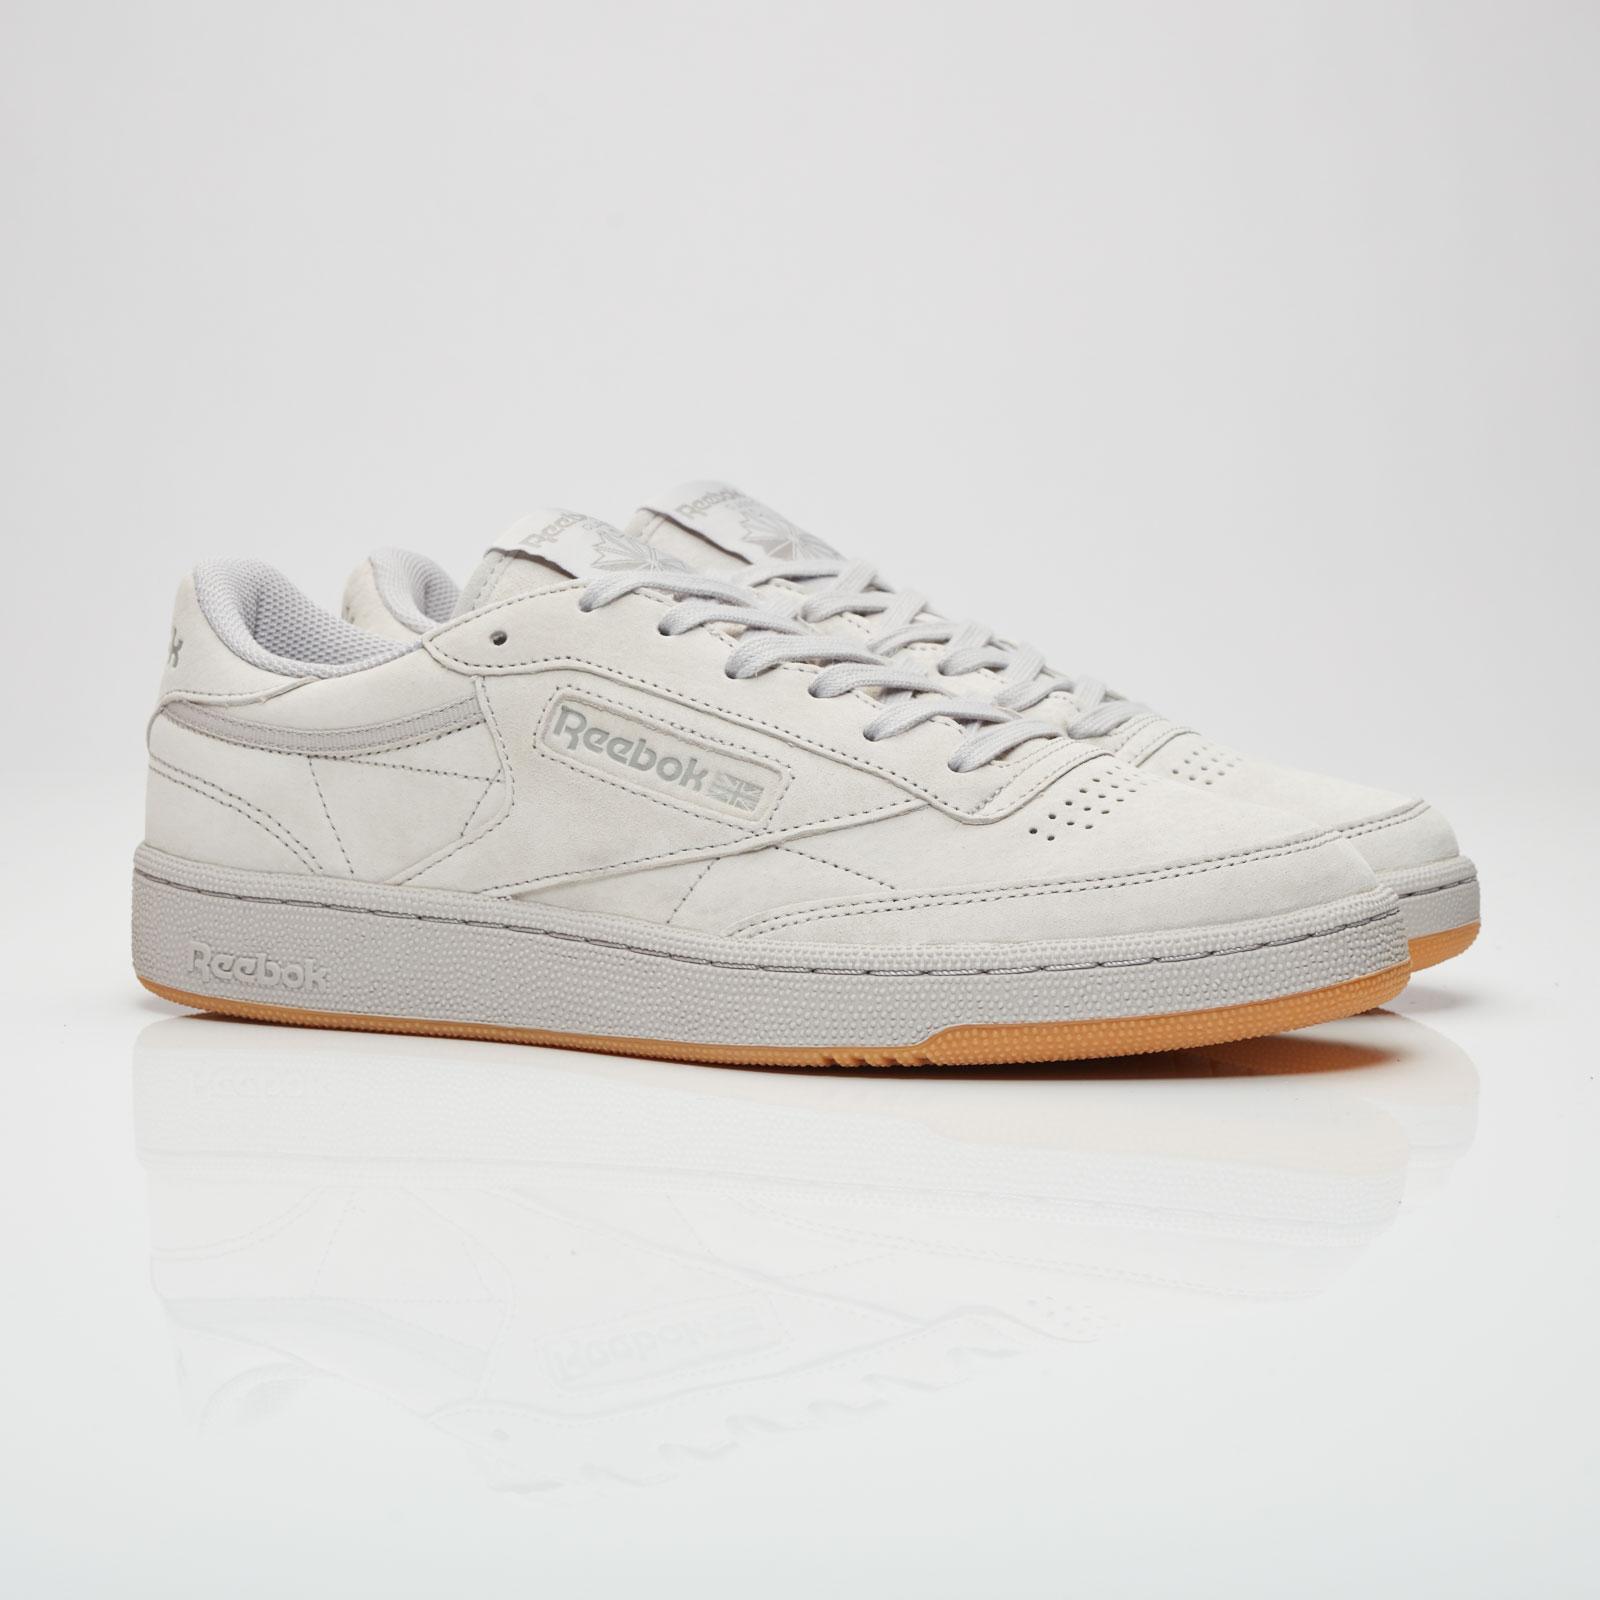 76e81256649 Reebok Club C 85 Tg Bd1886 Sneakersnstuff Sneakers